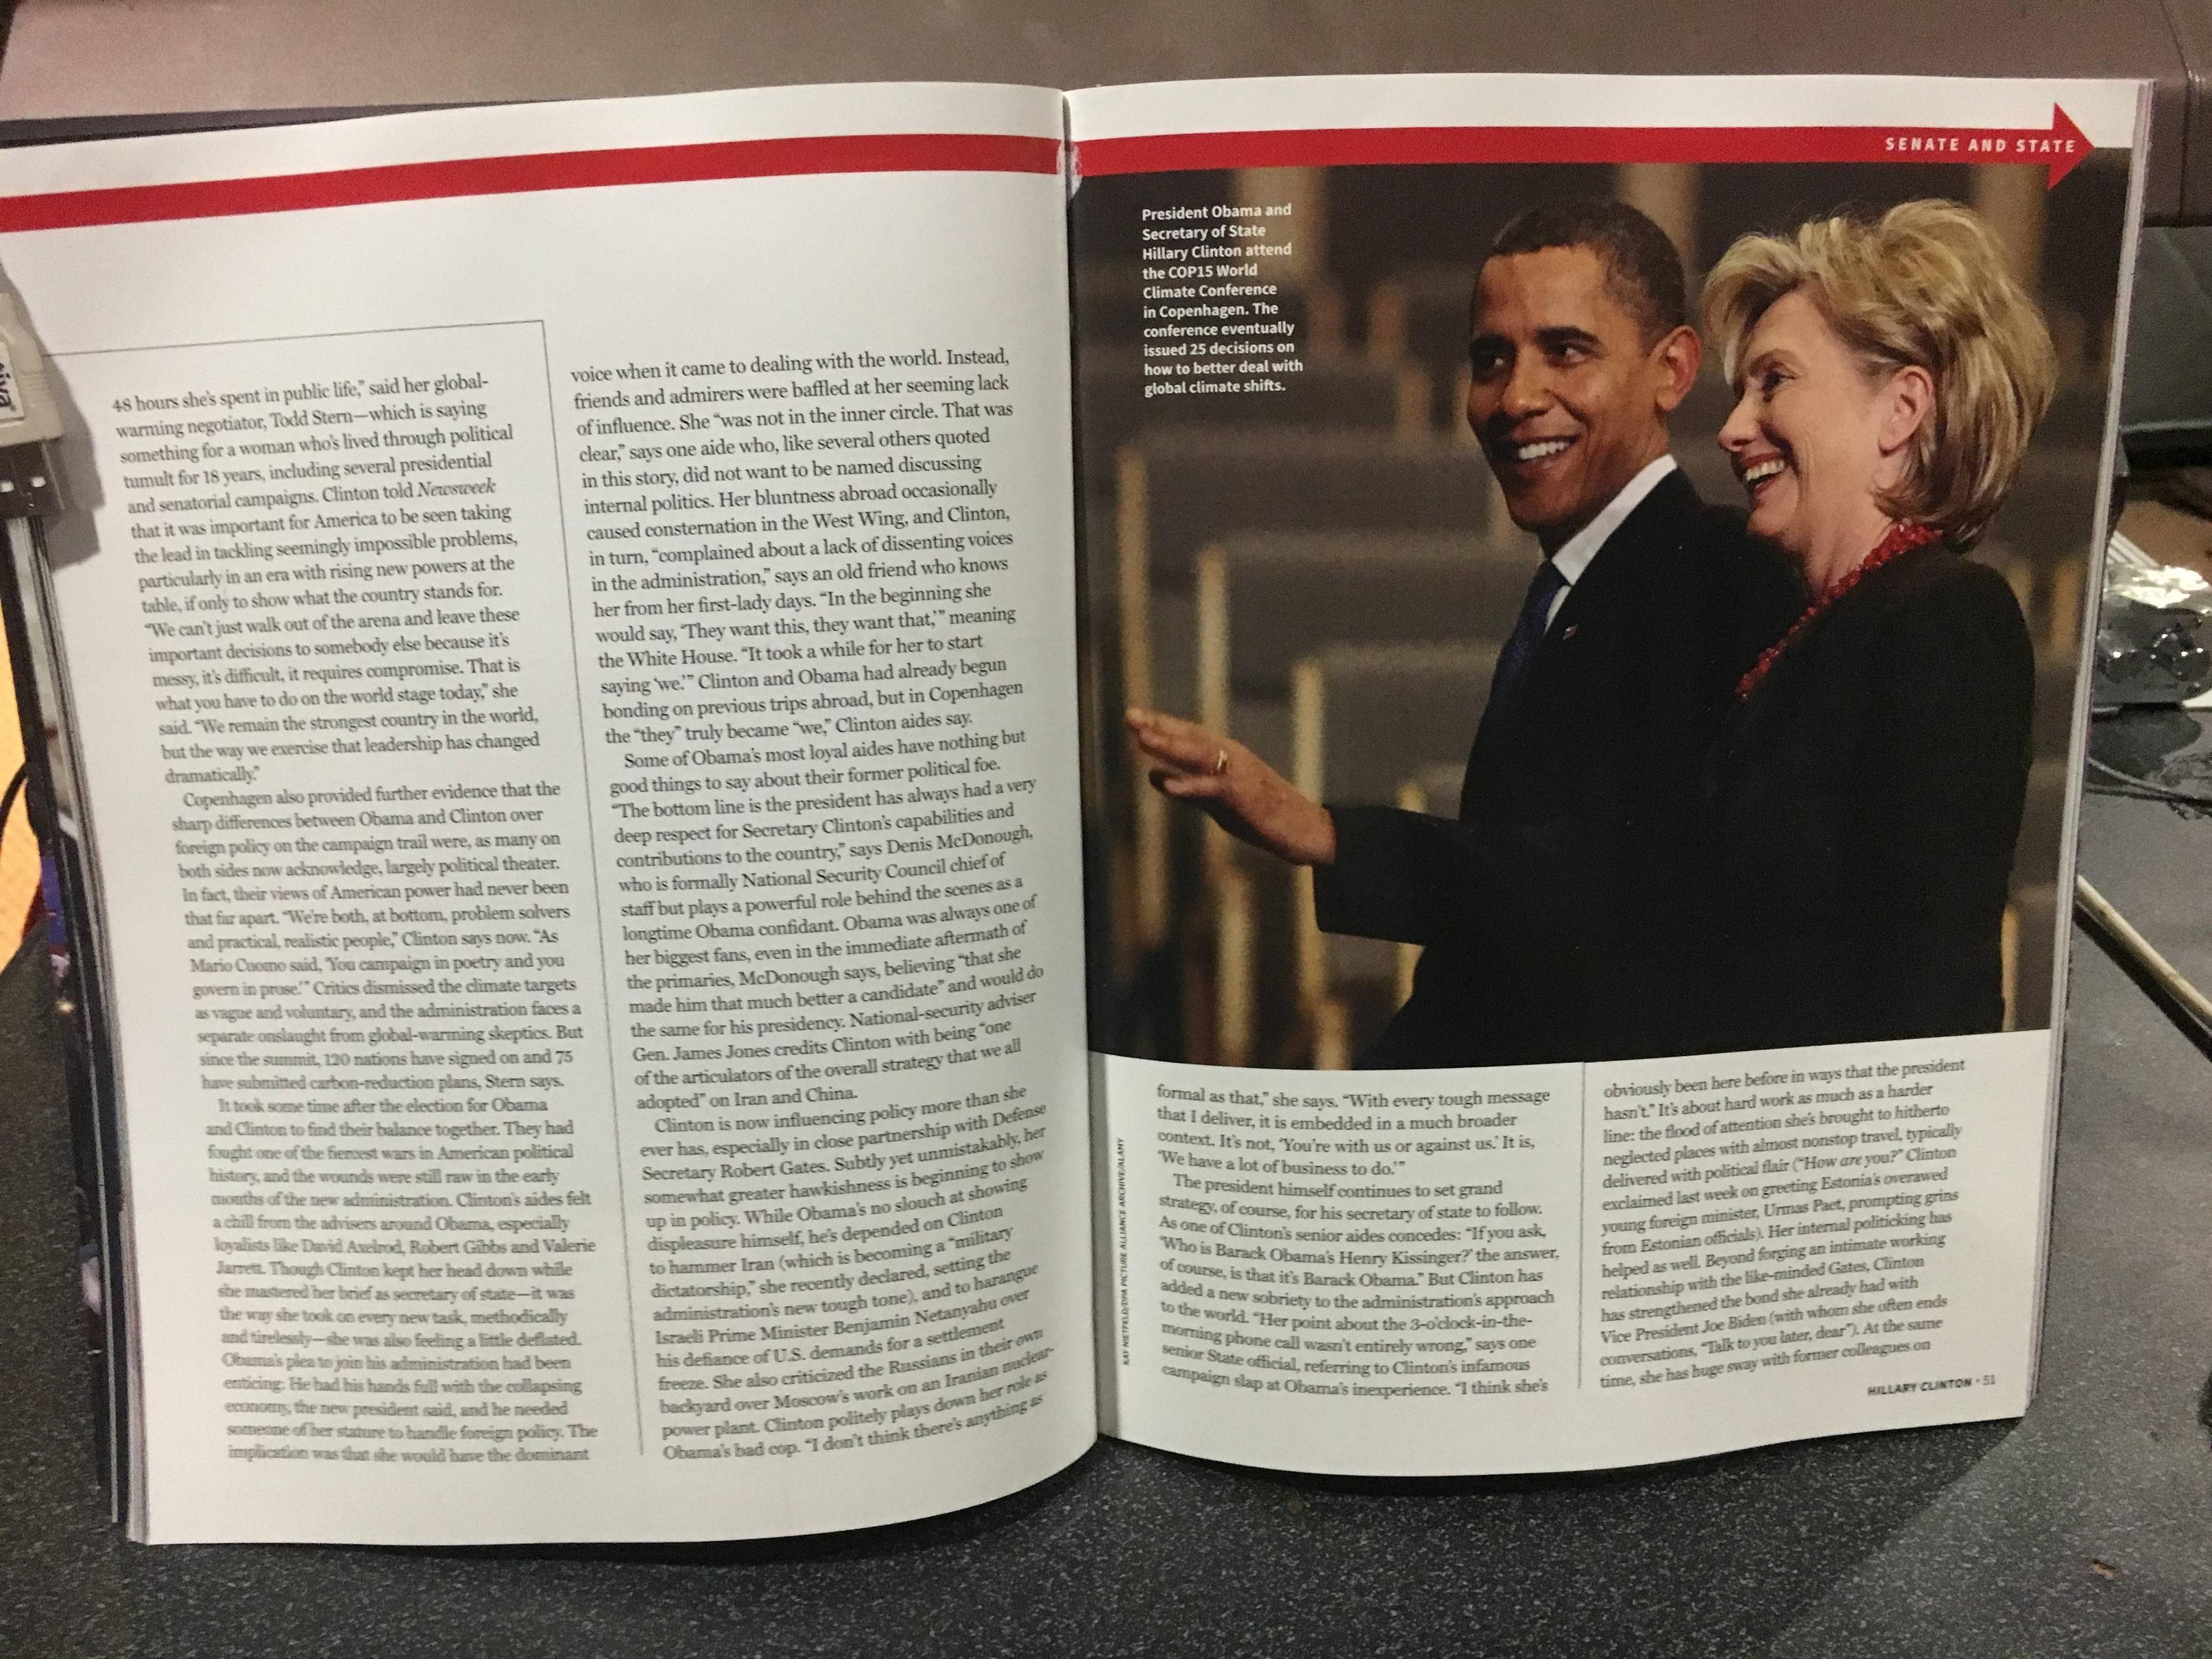 newsweek-madame-hillary-clinton-page-26